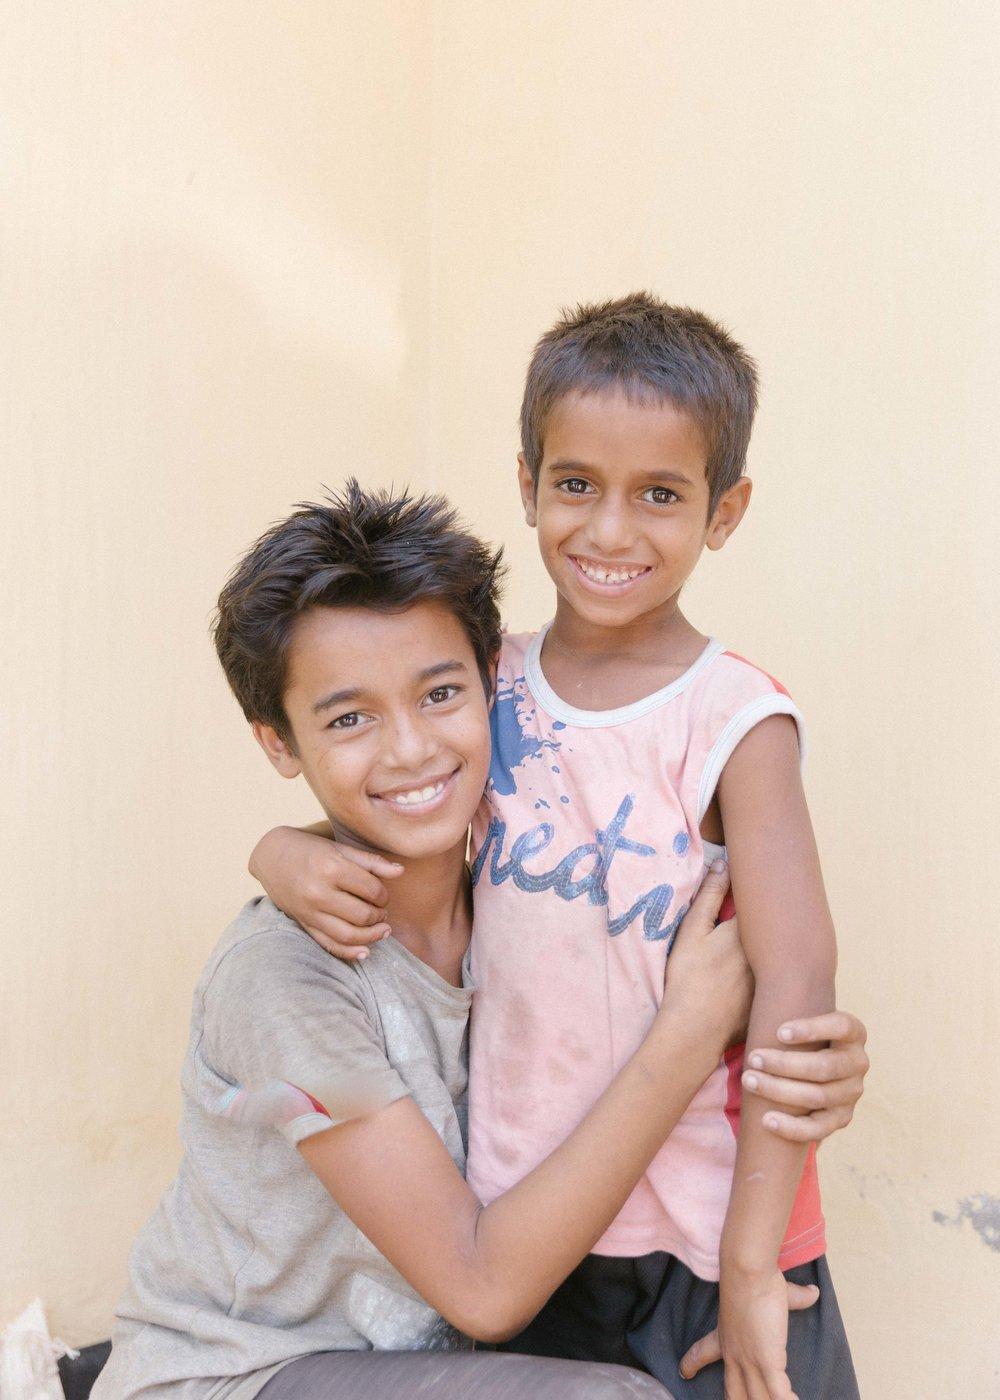 jessore_bangladesh_travel_portraiture_photography